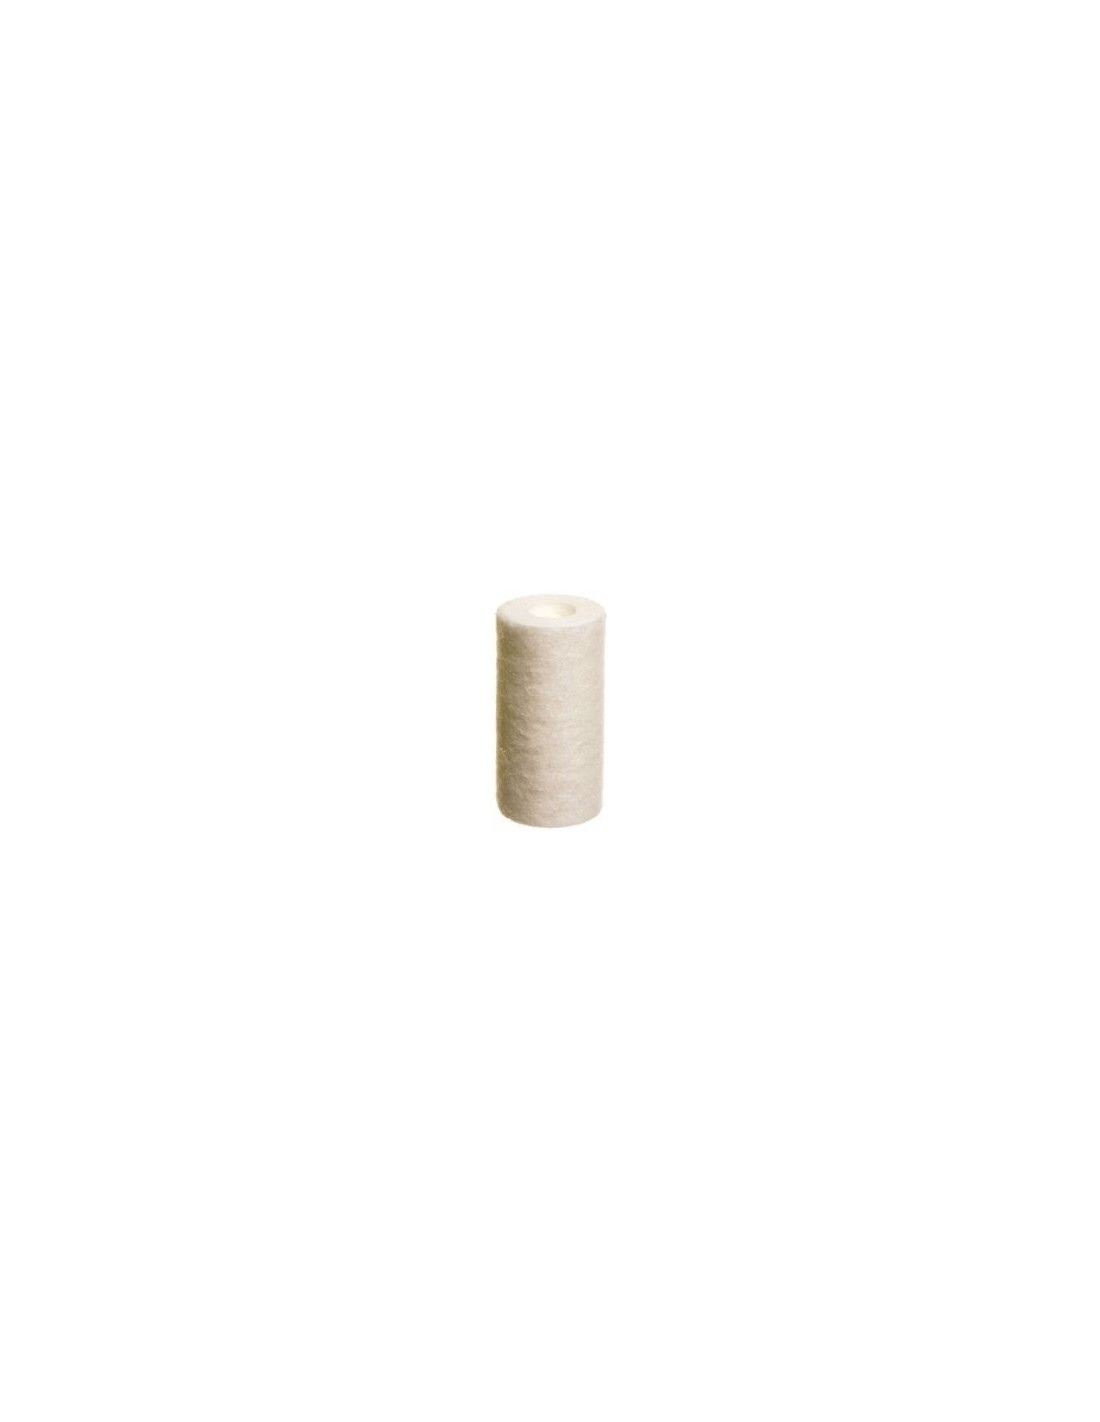 Sediment Filter - Cartridge - Klein - Yachticon - Onderhoud - 01.0726.0727